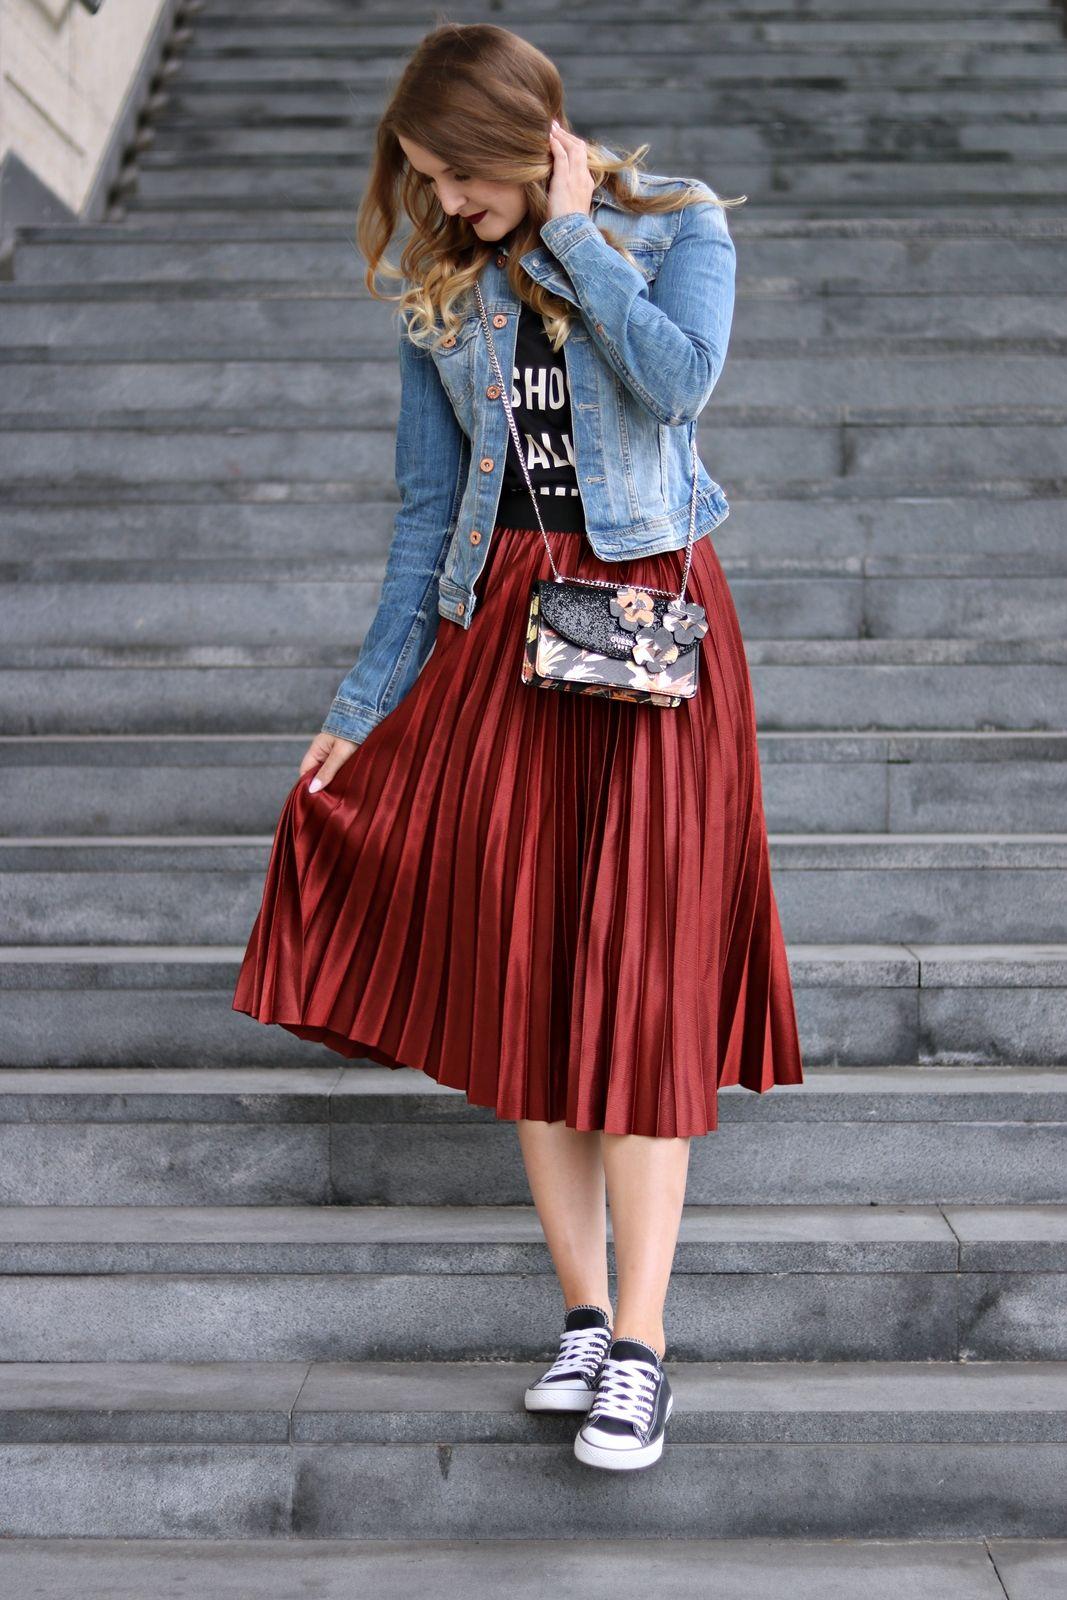 My Vienna Fashion Week Street Style Look – Fashionladyloves – Fashion